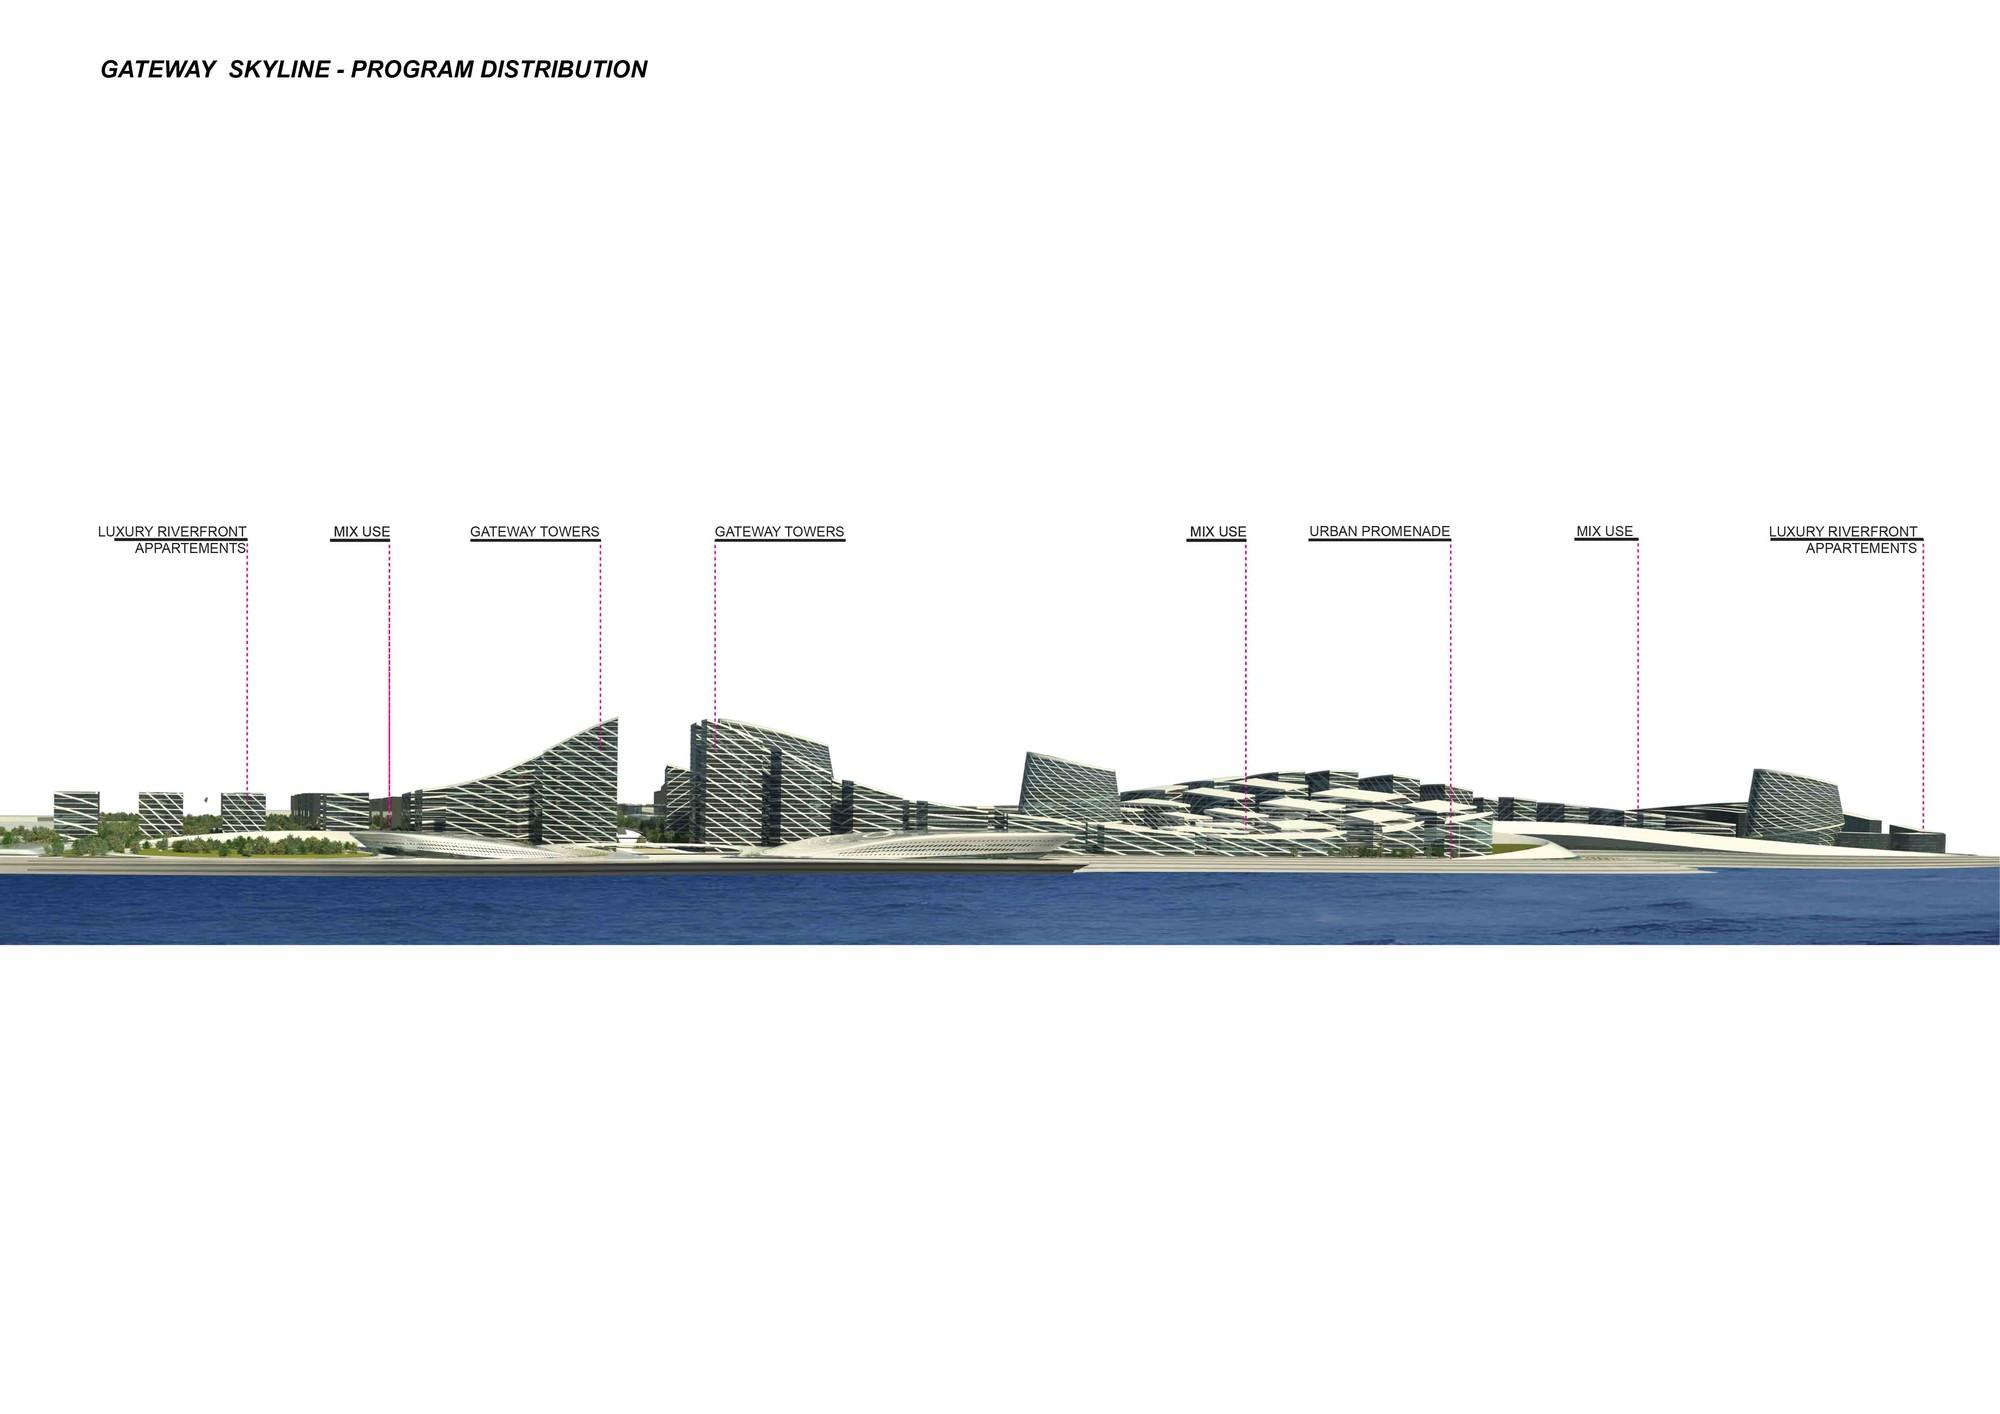 medium resolution of kanpur riverfront development proposal studio symbiosis gateway skyline program distribution diagram 03